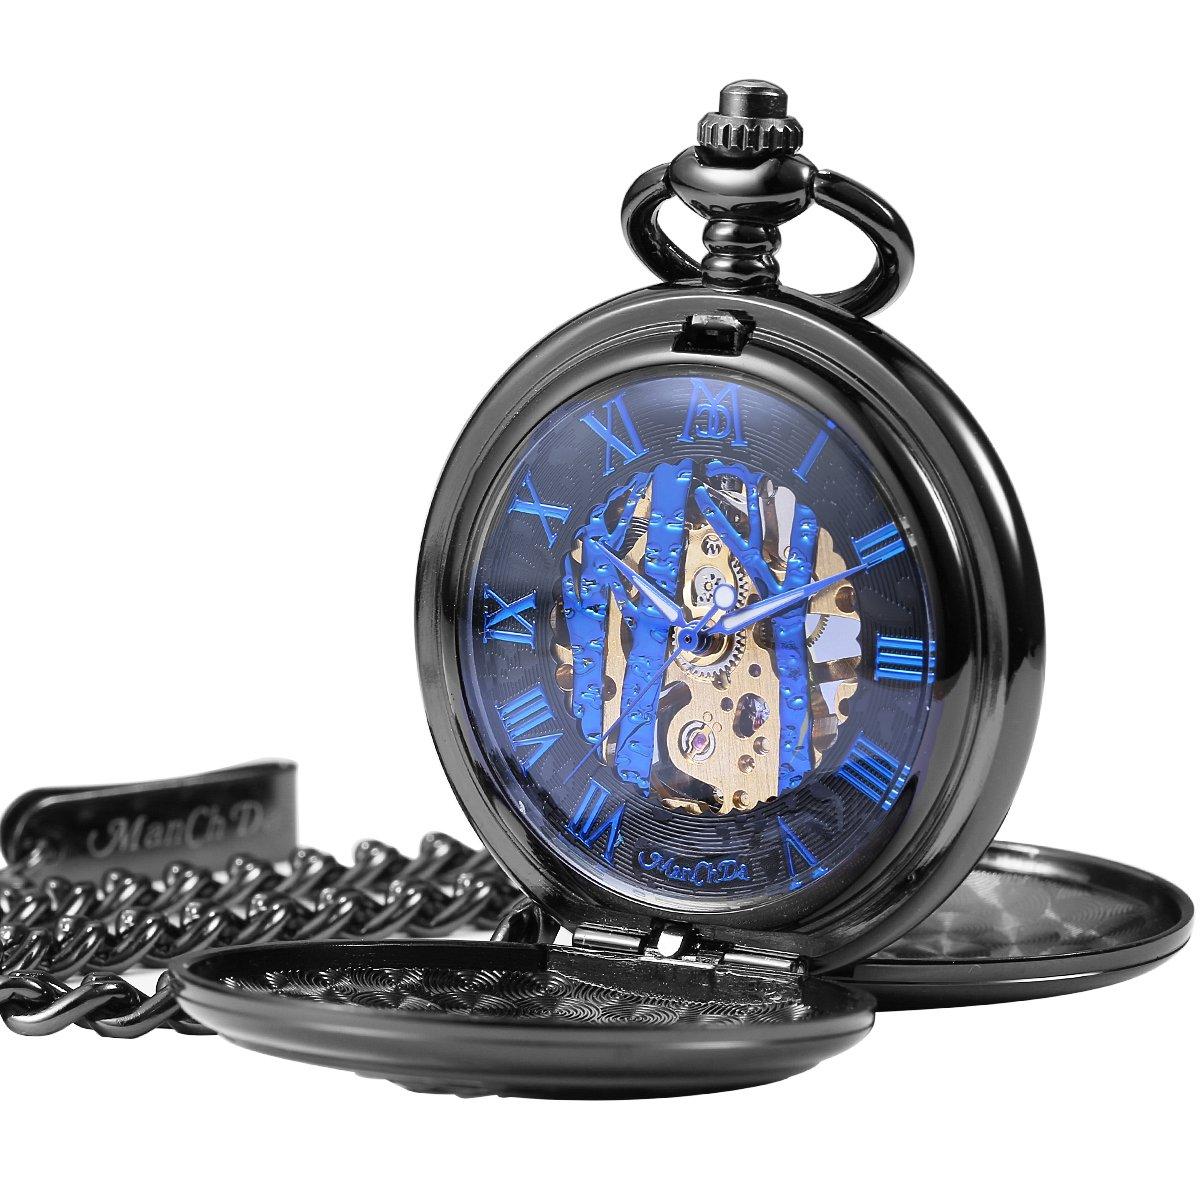 ManChDa Vintage Reindeer Pocket Watch Black Hollow Case Double Open Skeleton Mechanical for Men Women